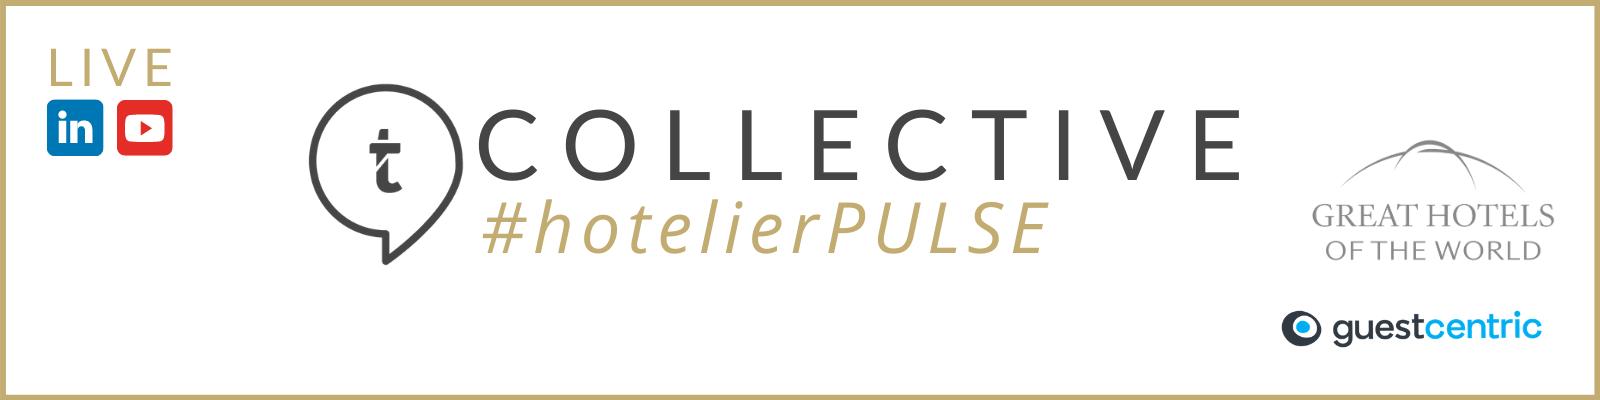 COLLECTIVE #hotelierPULSE l Live Think Tank